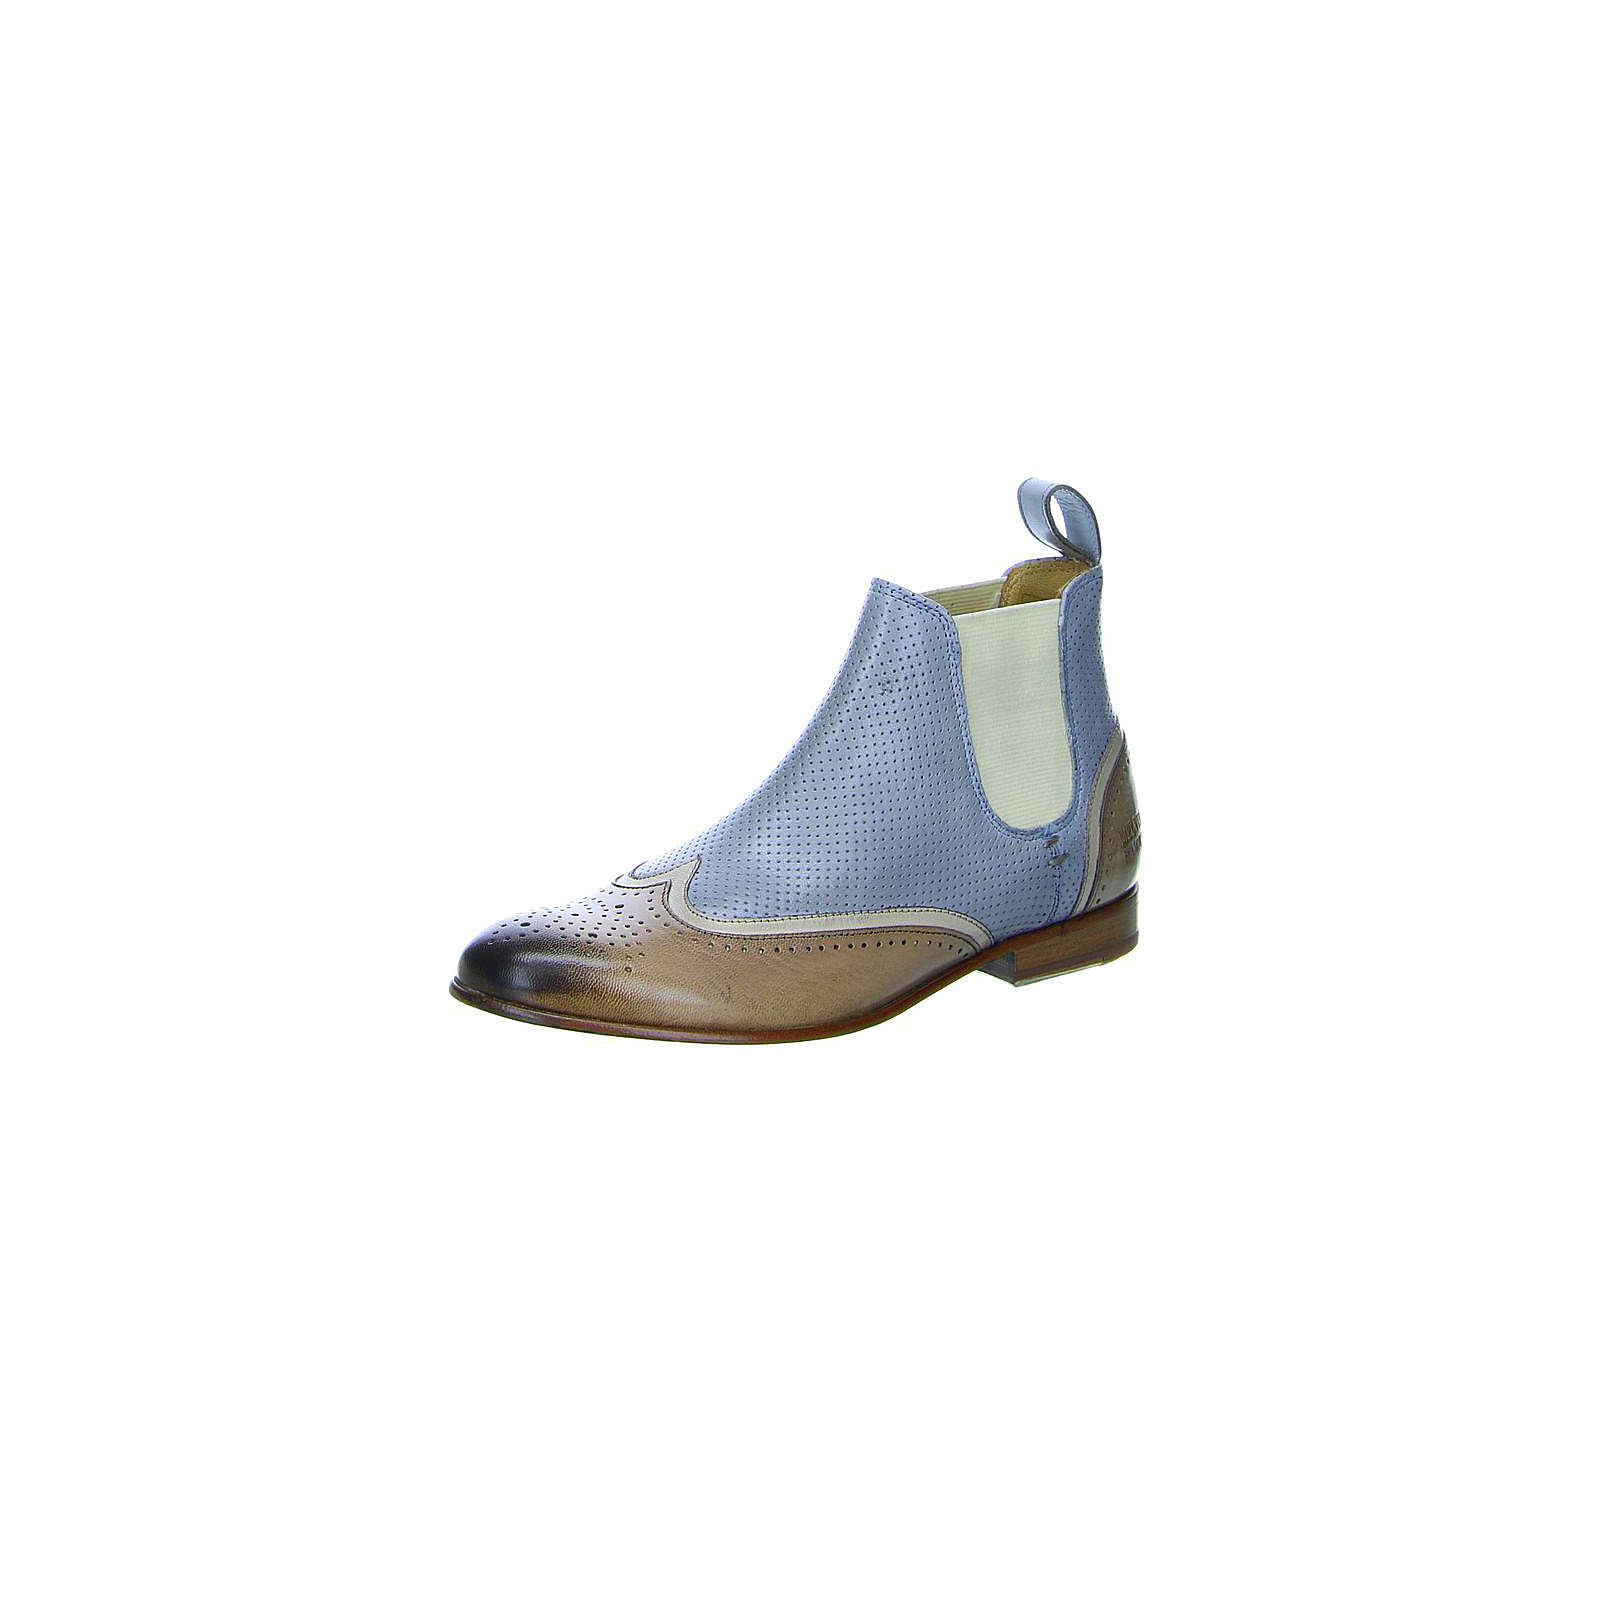 MELVIN & HAMILTON Chelsea Boots braun/blau Damen Gr. 37